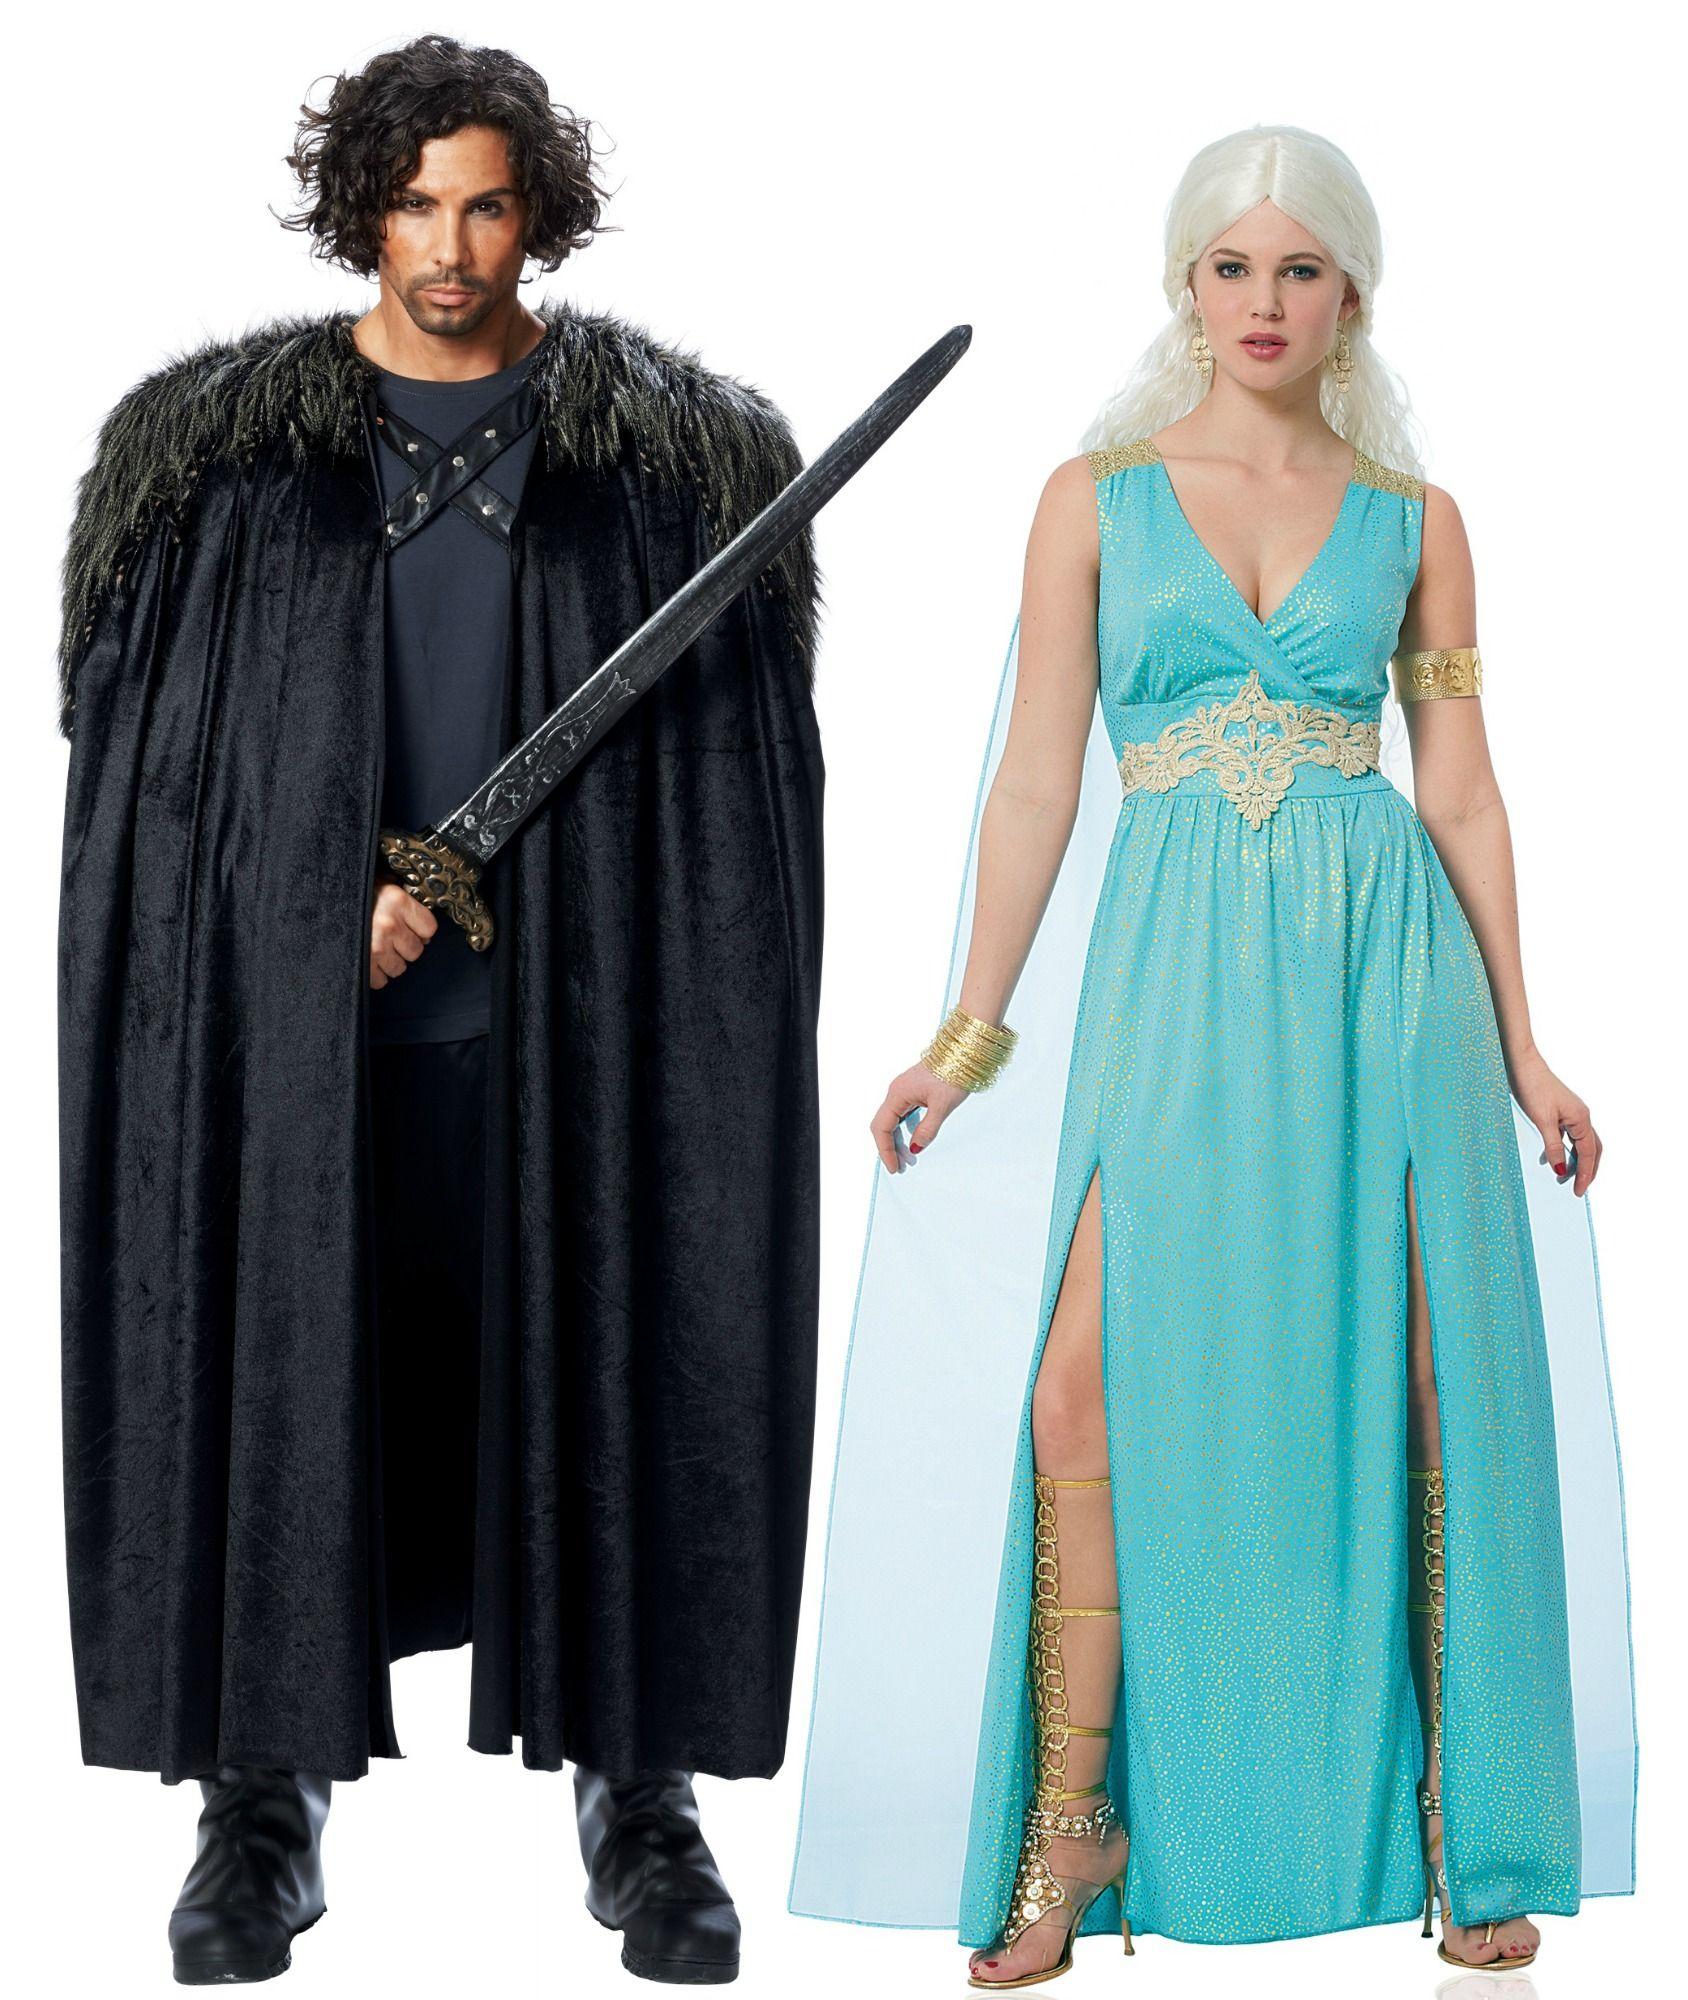 Game of Thrones themed couples costume idea | Halloween | Pinterest